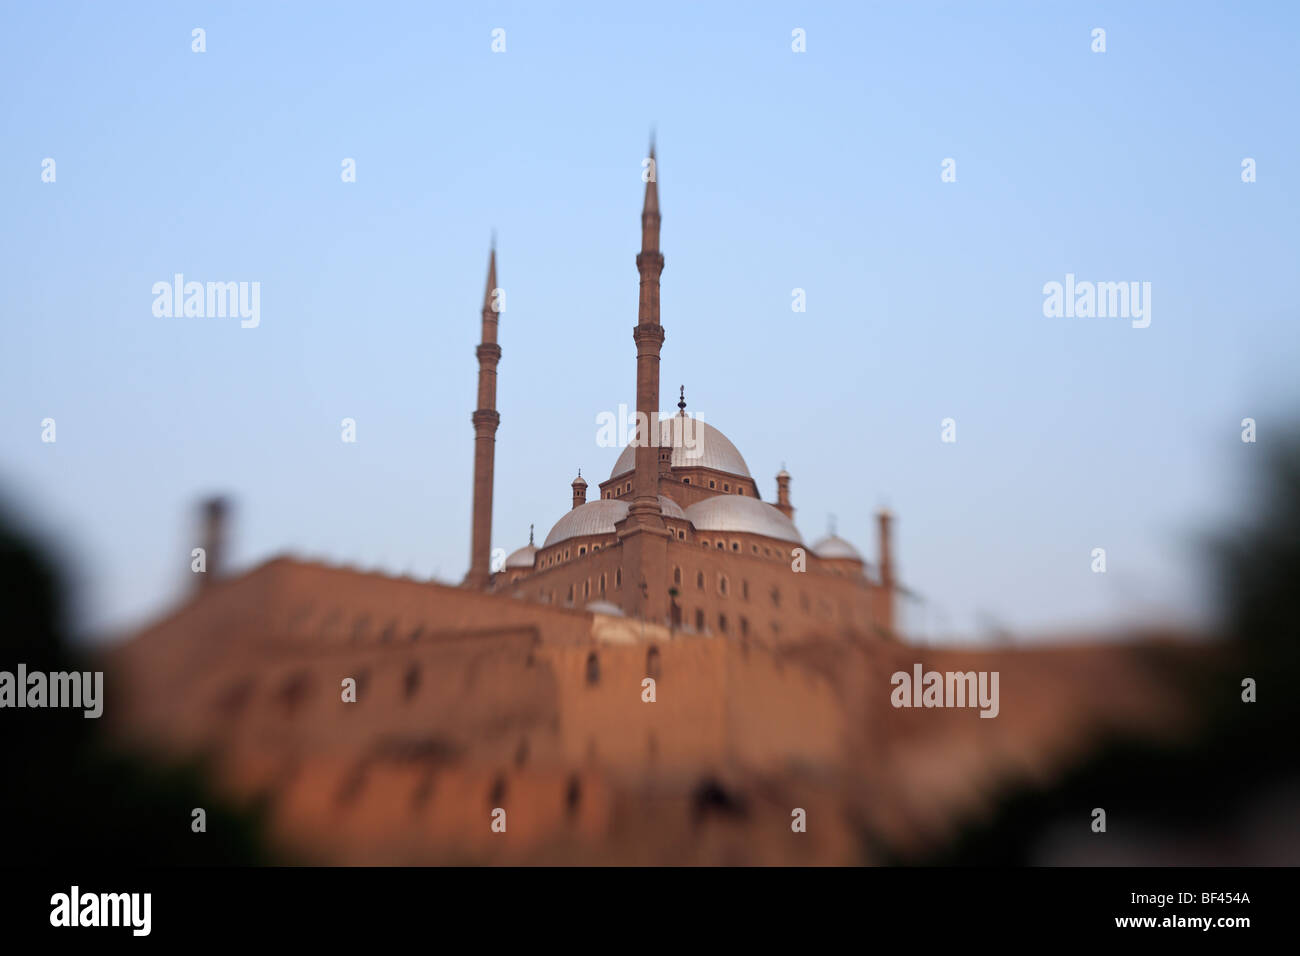 Mosque of Muhammad Ali on the Citadel - Cairo, Egypt. - Stock Image